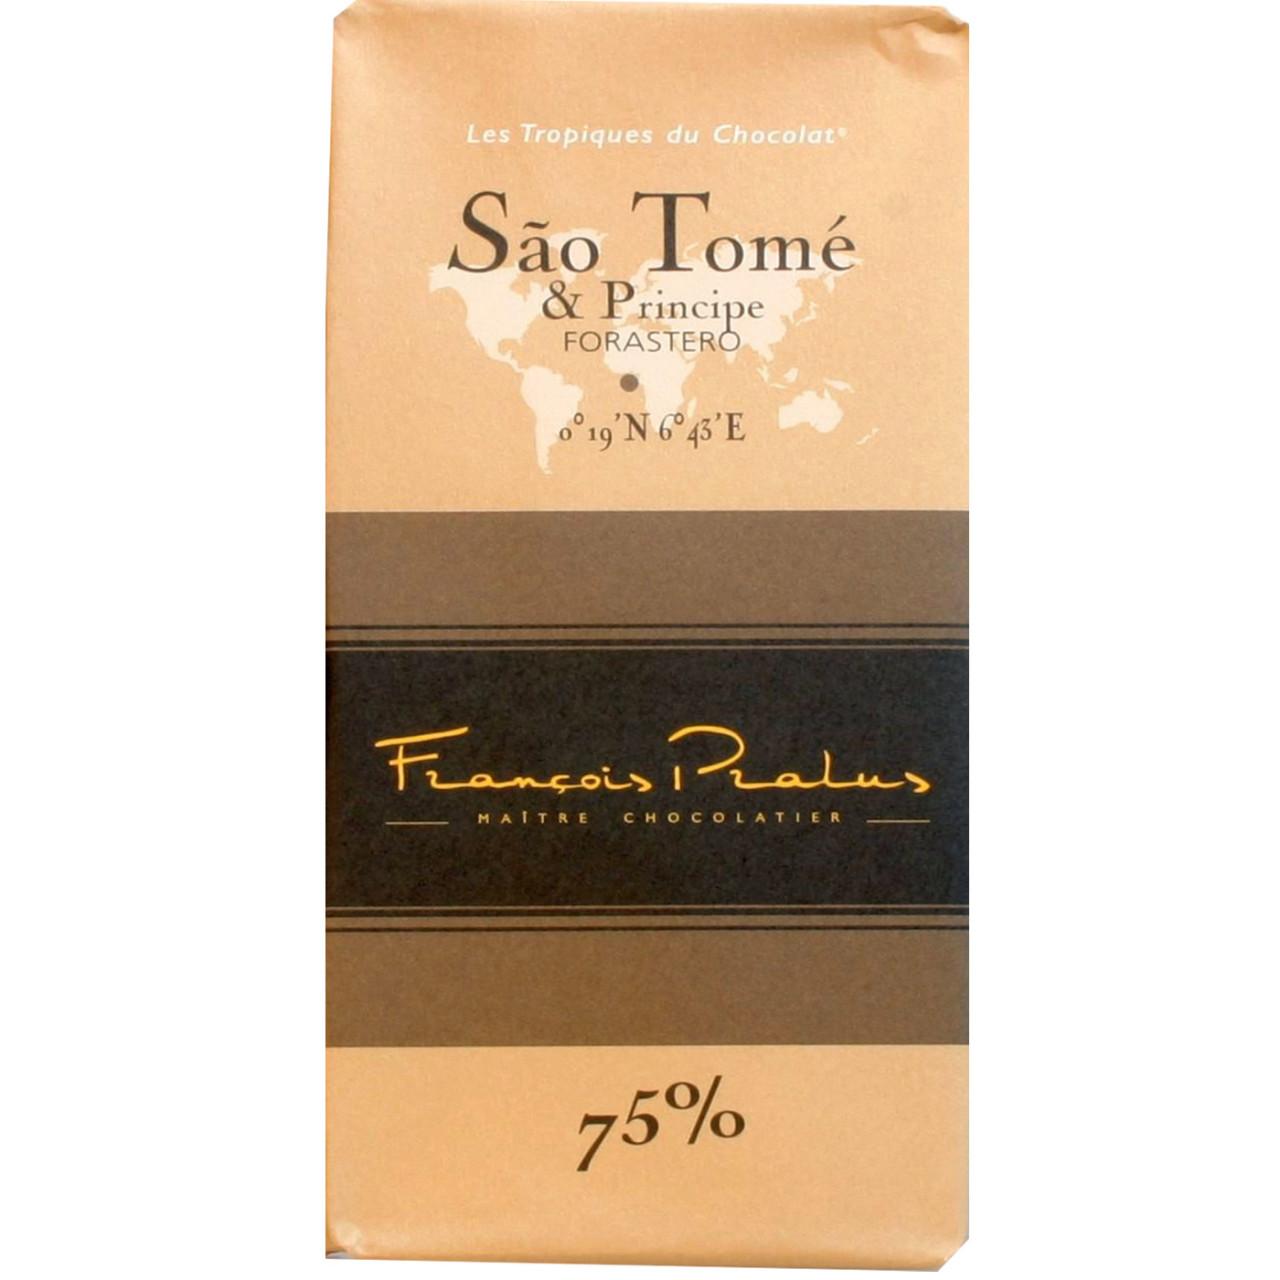 Dunkle Schokolade, 75%, Sao Tomé, Forastero, chocolat noir, dark chocolate, Afrika, Afrique, Africa, bean to bar,